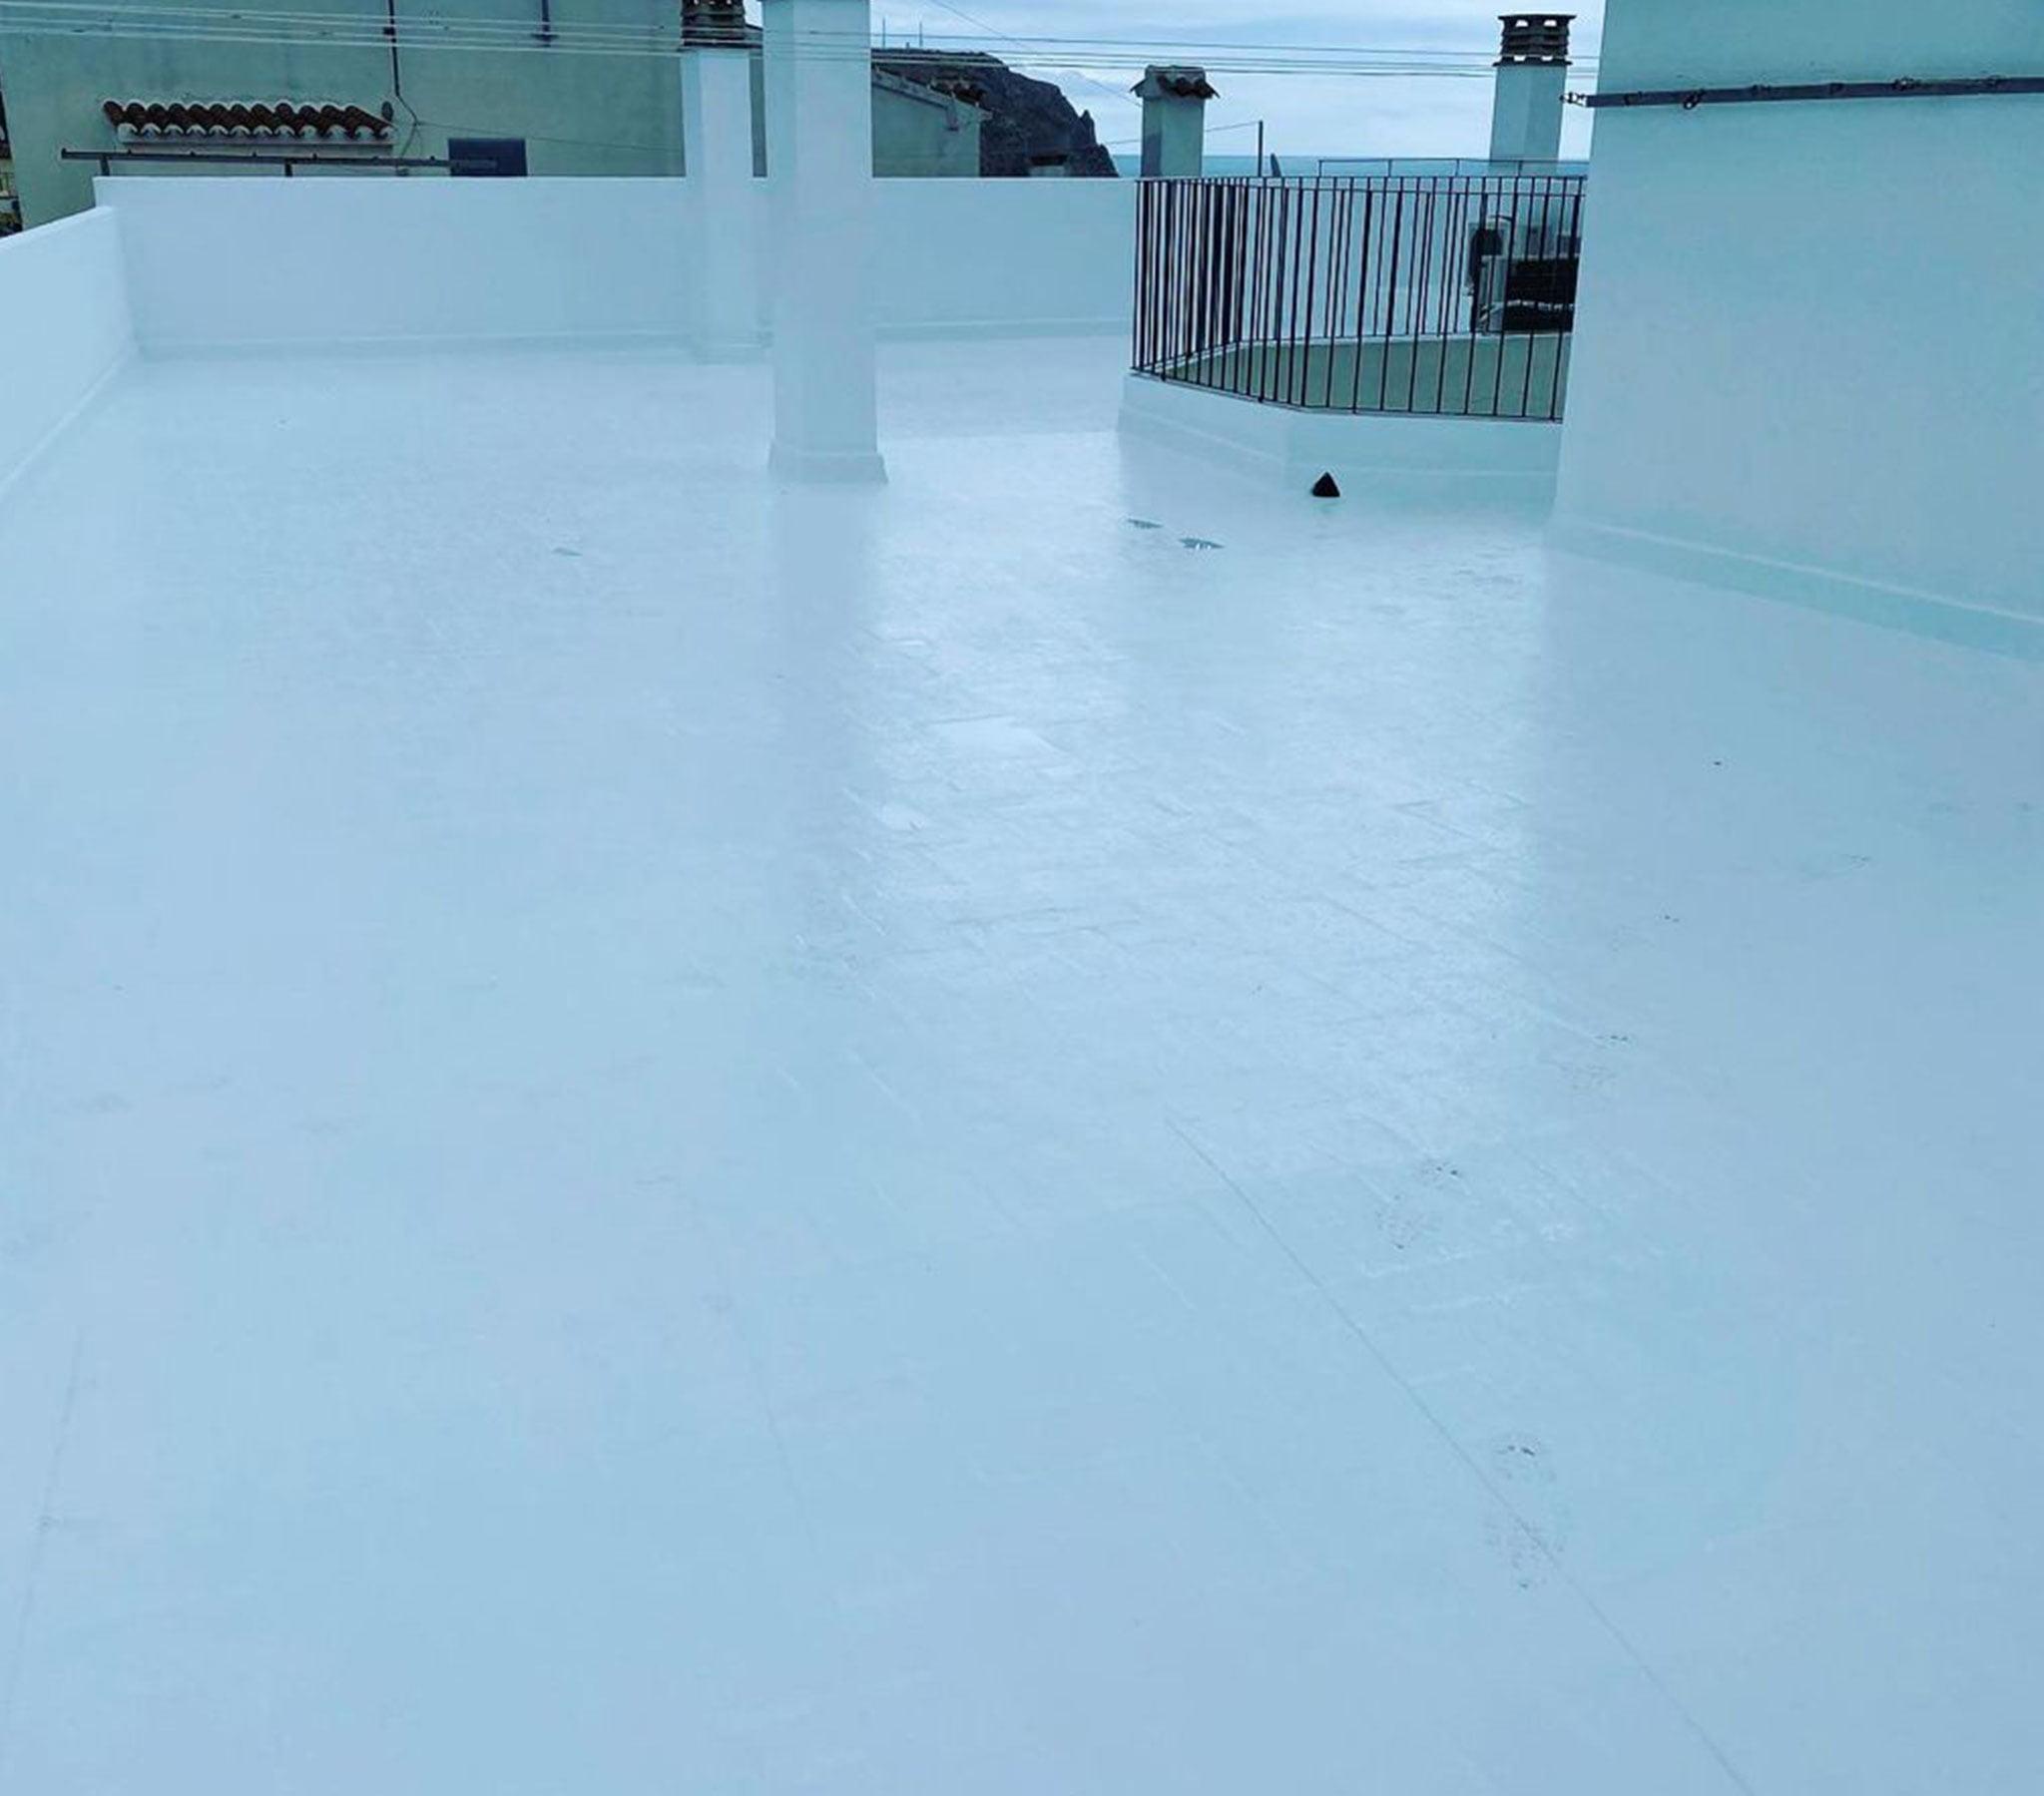 Después de la impermeabilización de una terraza – Pinturas Juanvi Ortolà